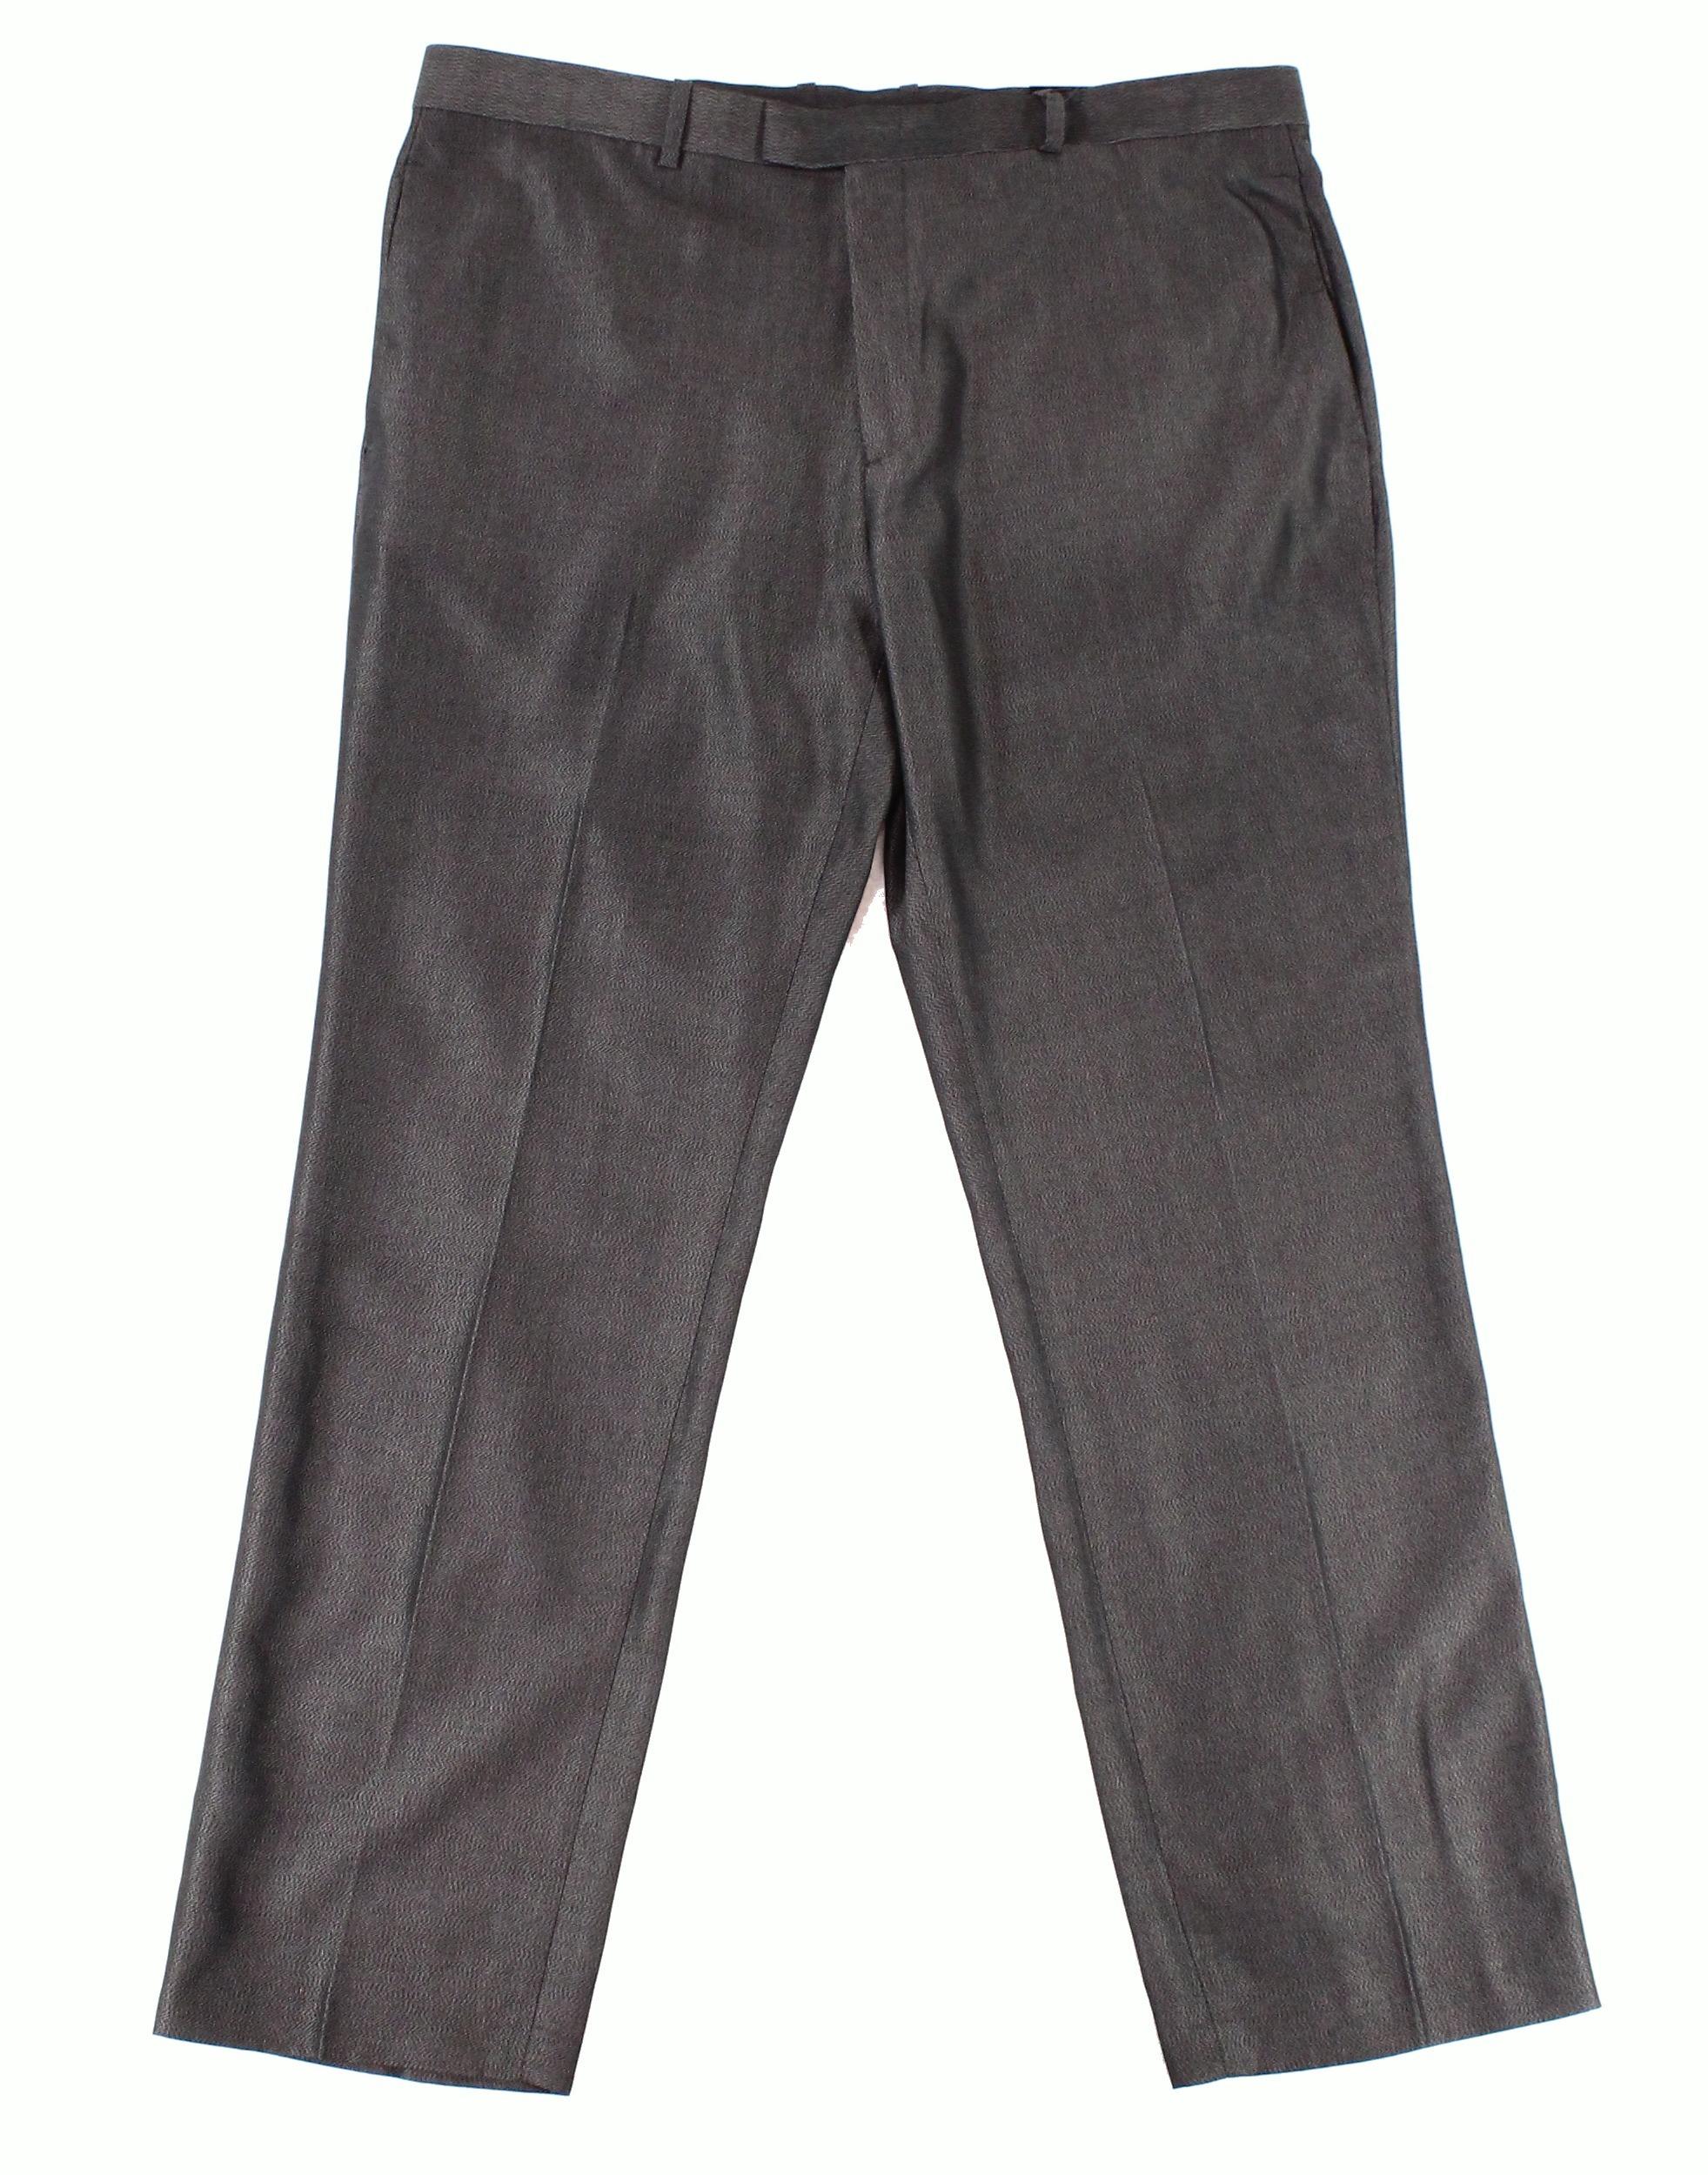 Alfani NEW Black Mens Size 40x32 Embossed Dress Flat Front Pants